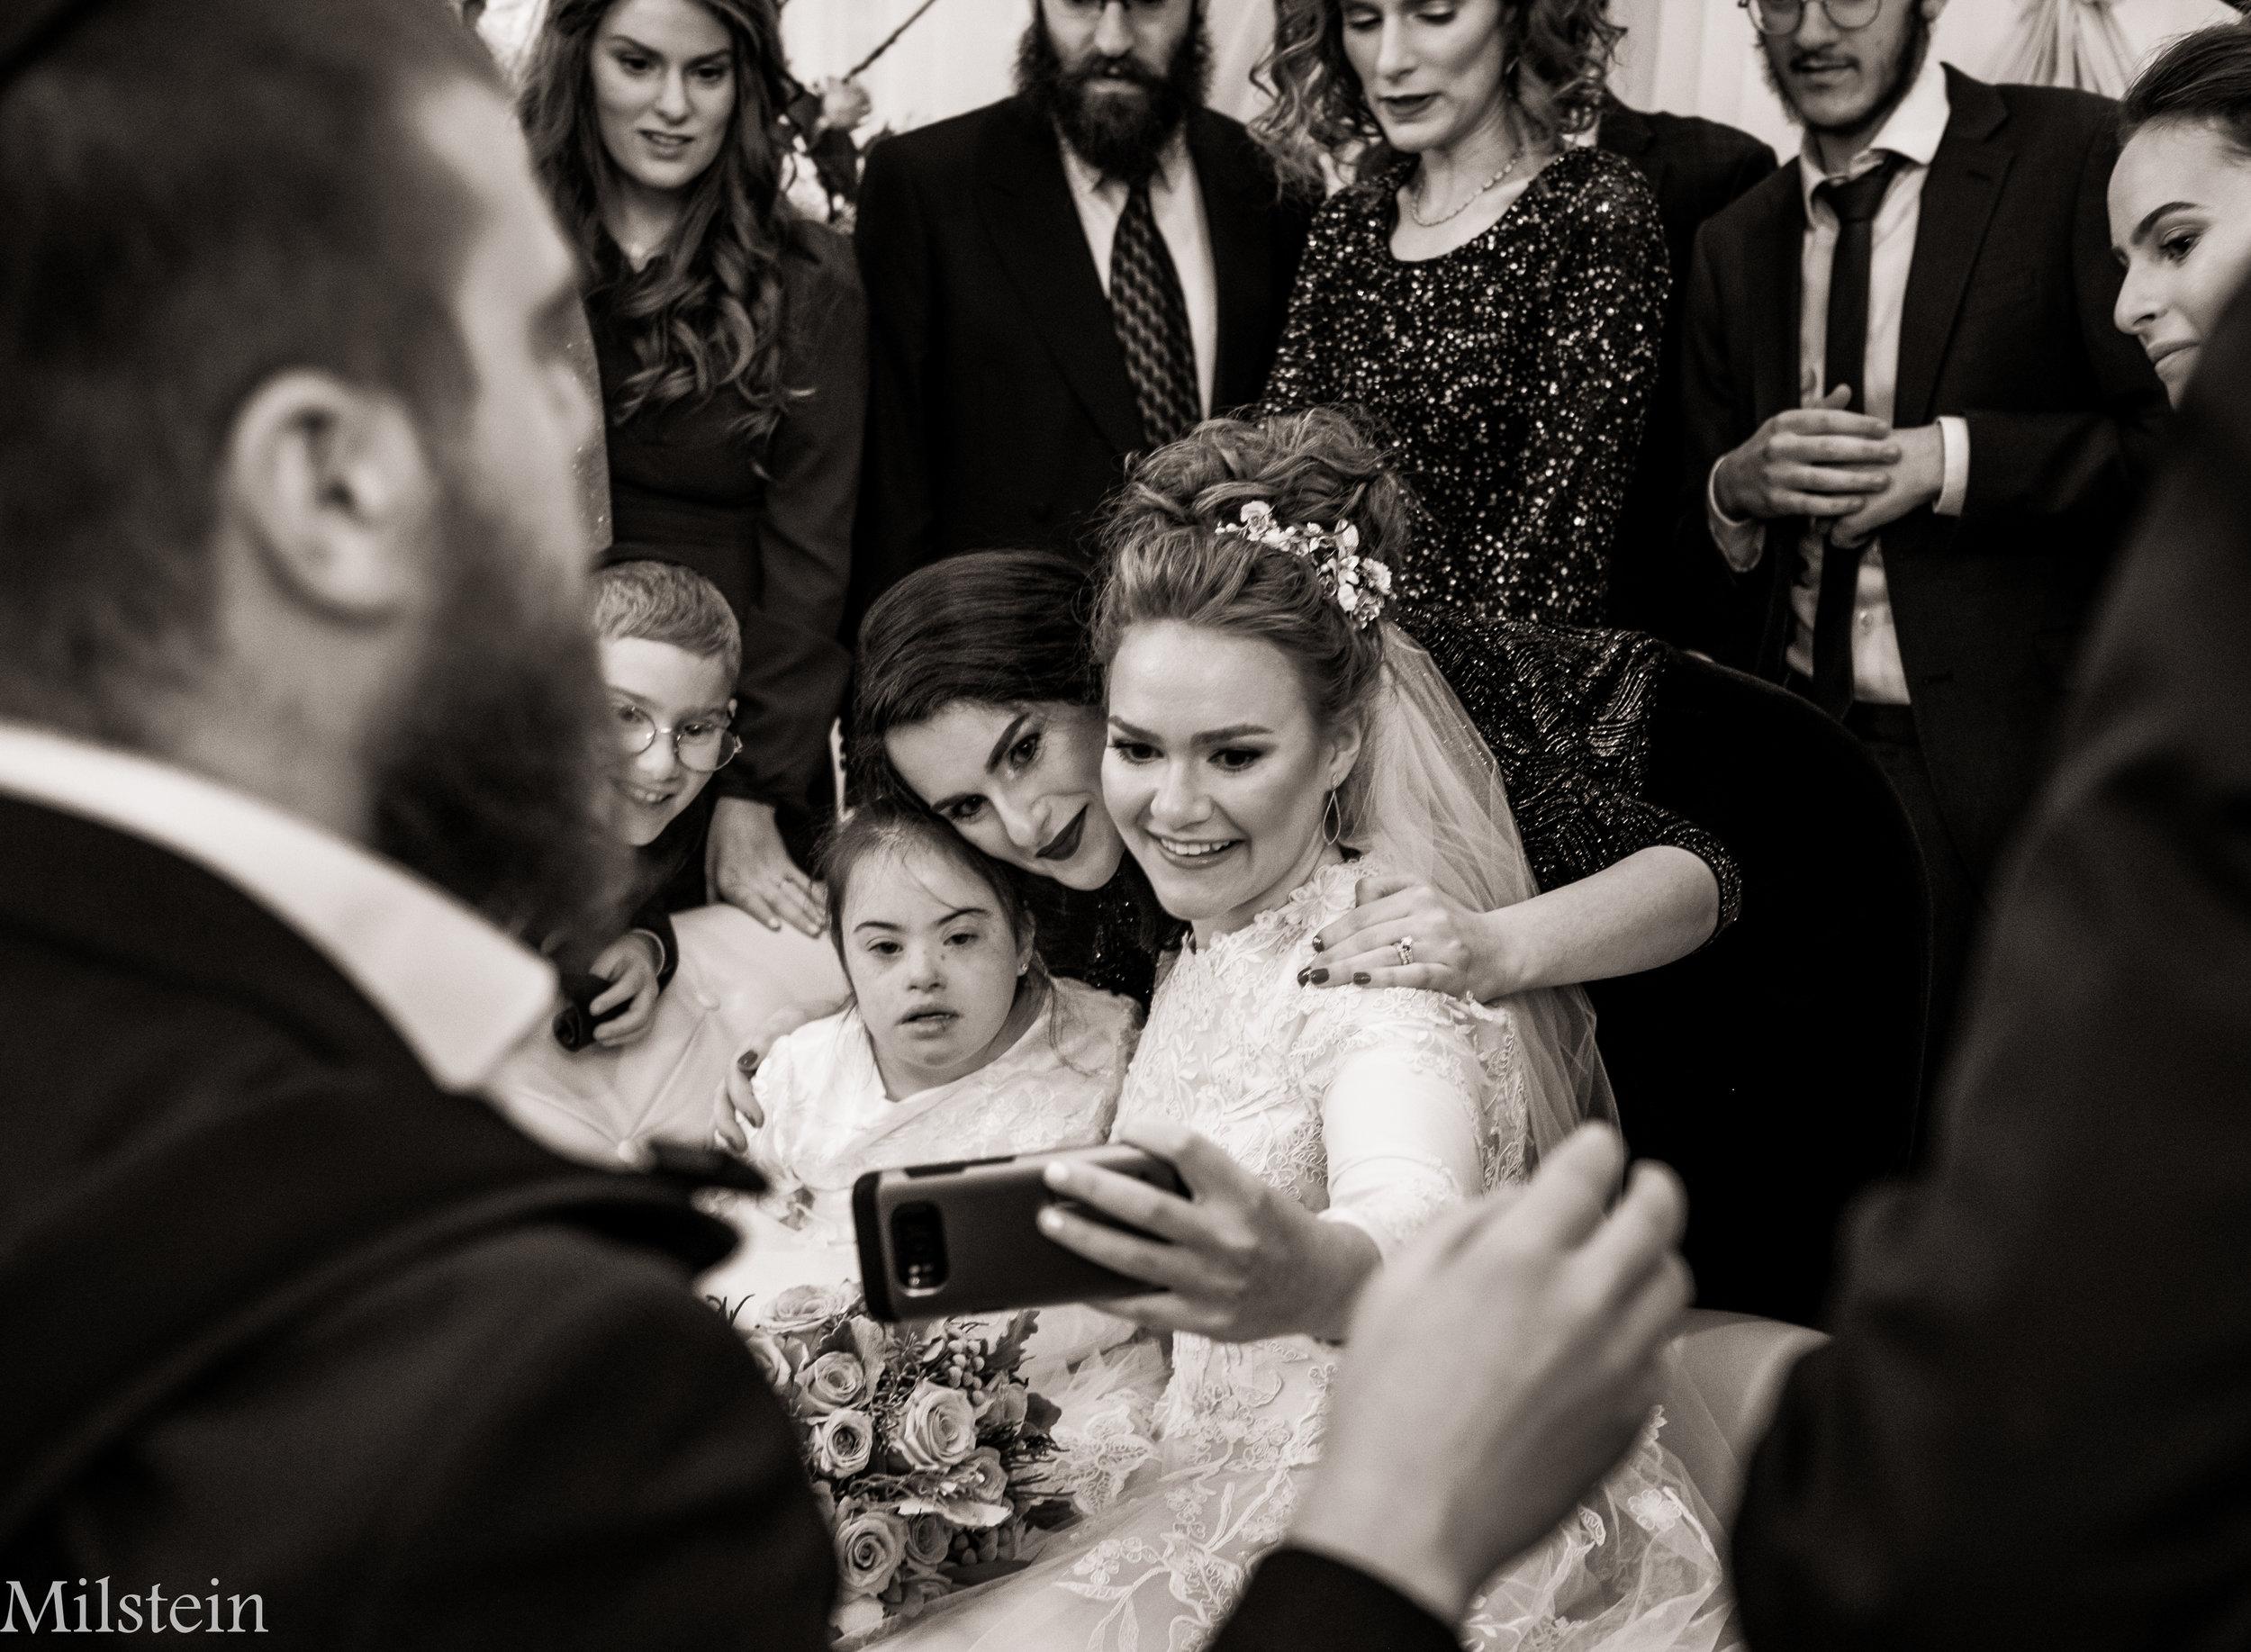 Amy Milstein - New York documentary wedding photographer